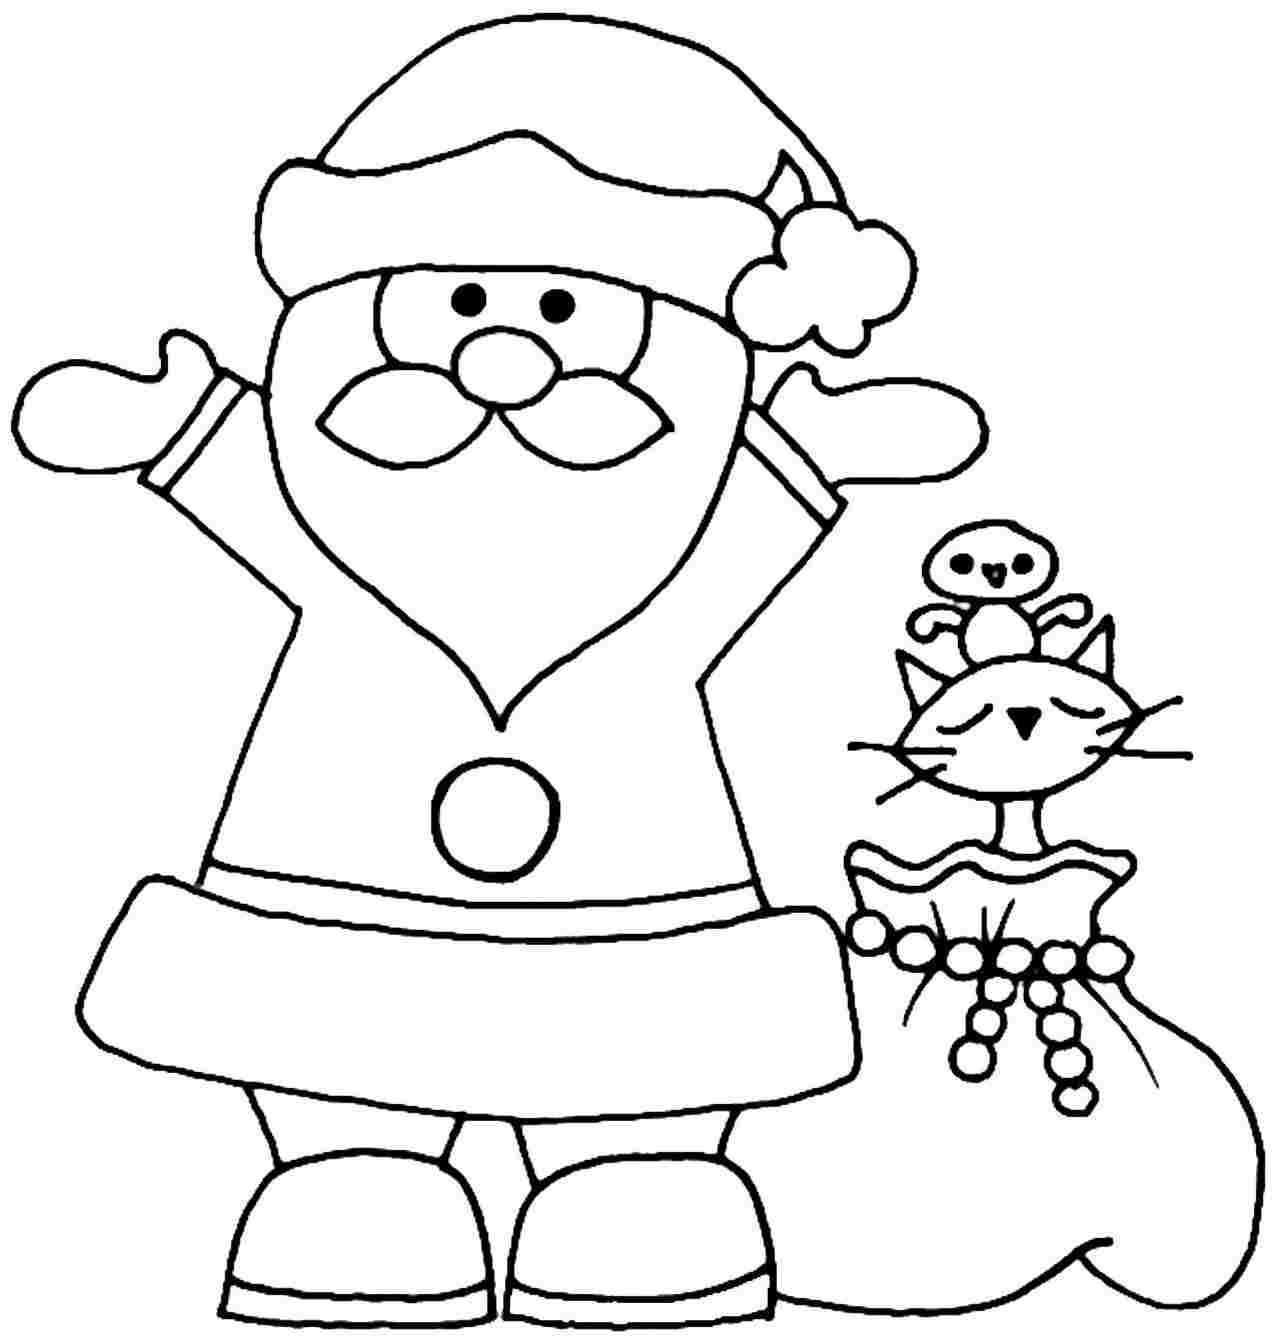 coloring sheets Christmas santa claus printable free for